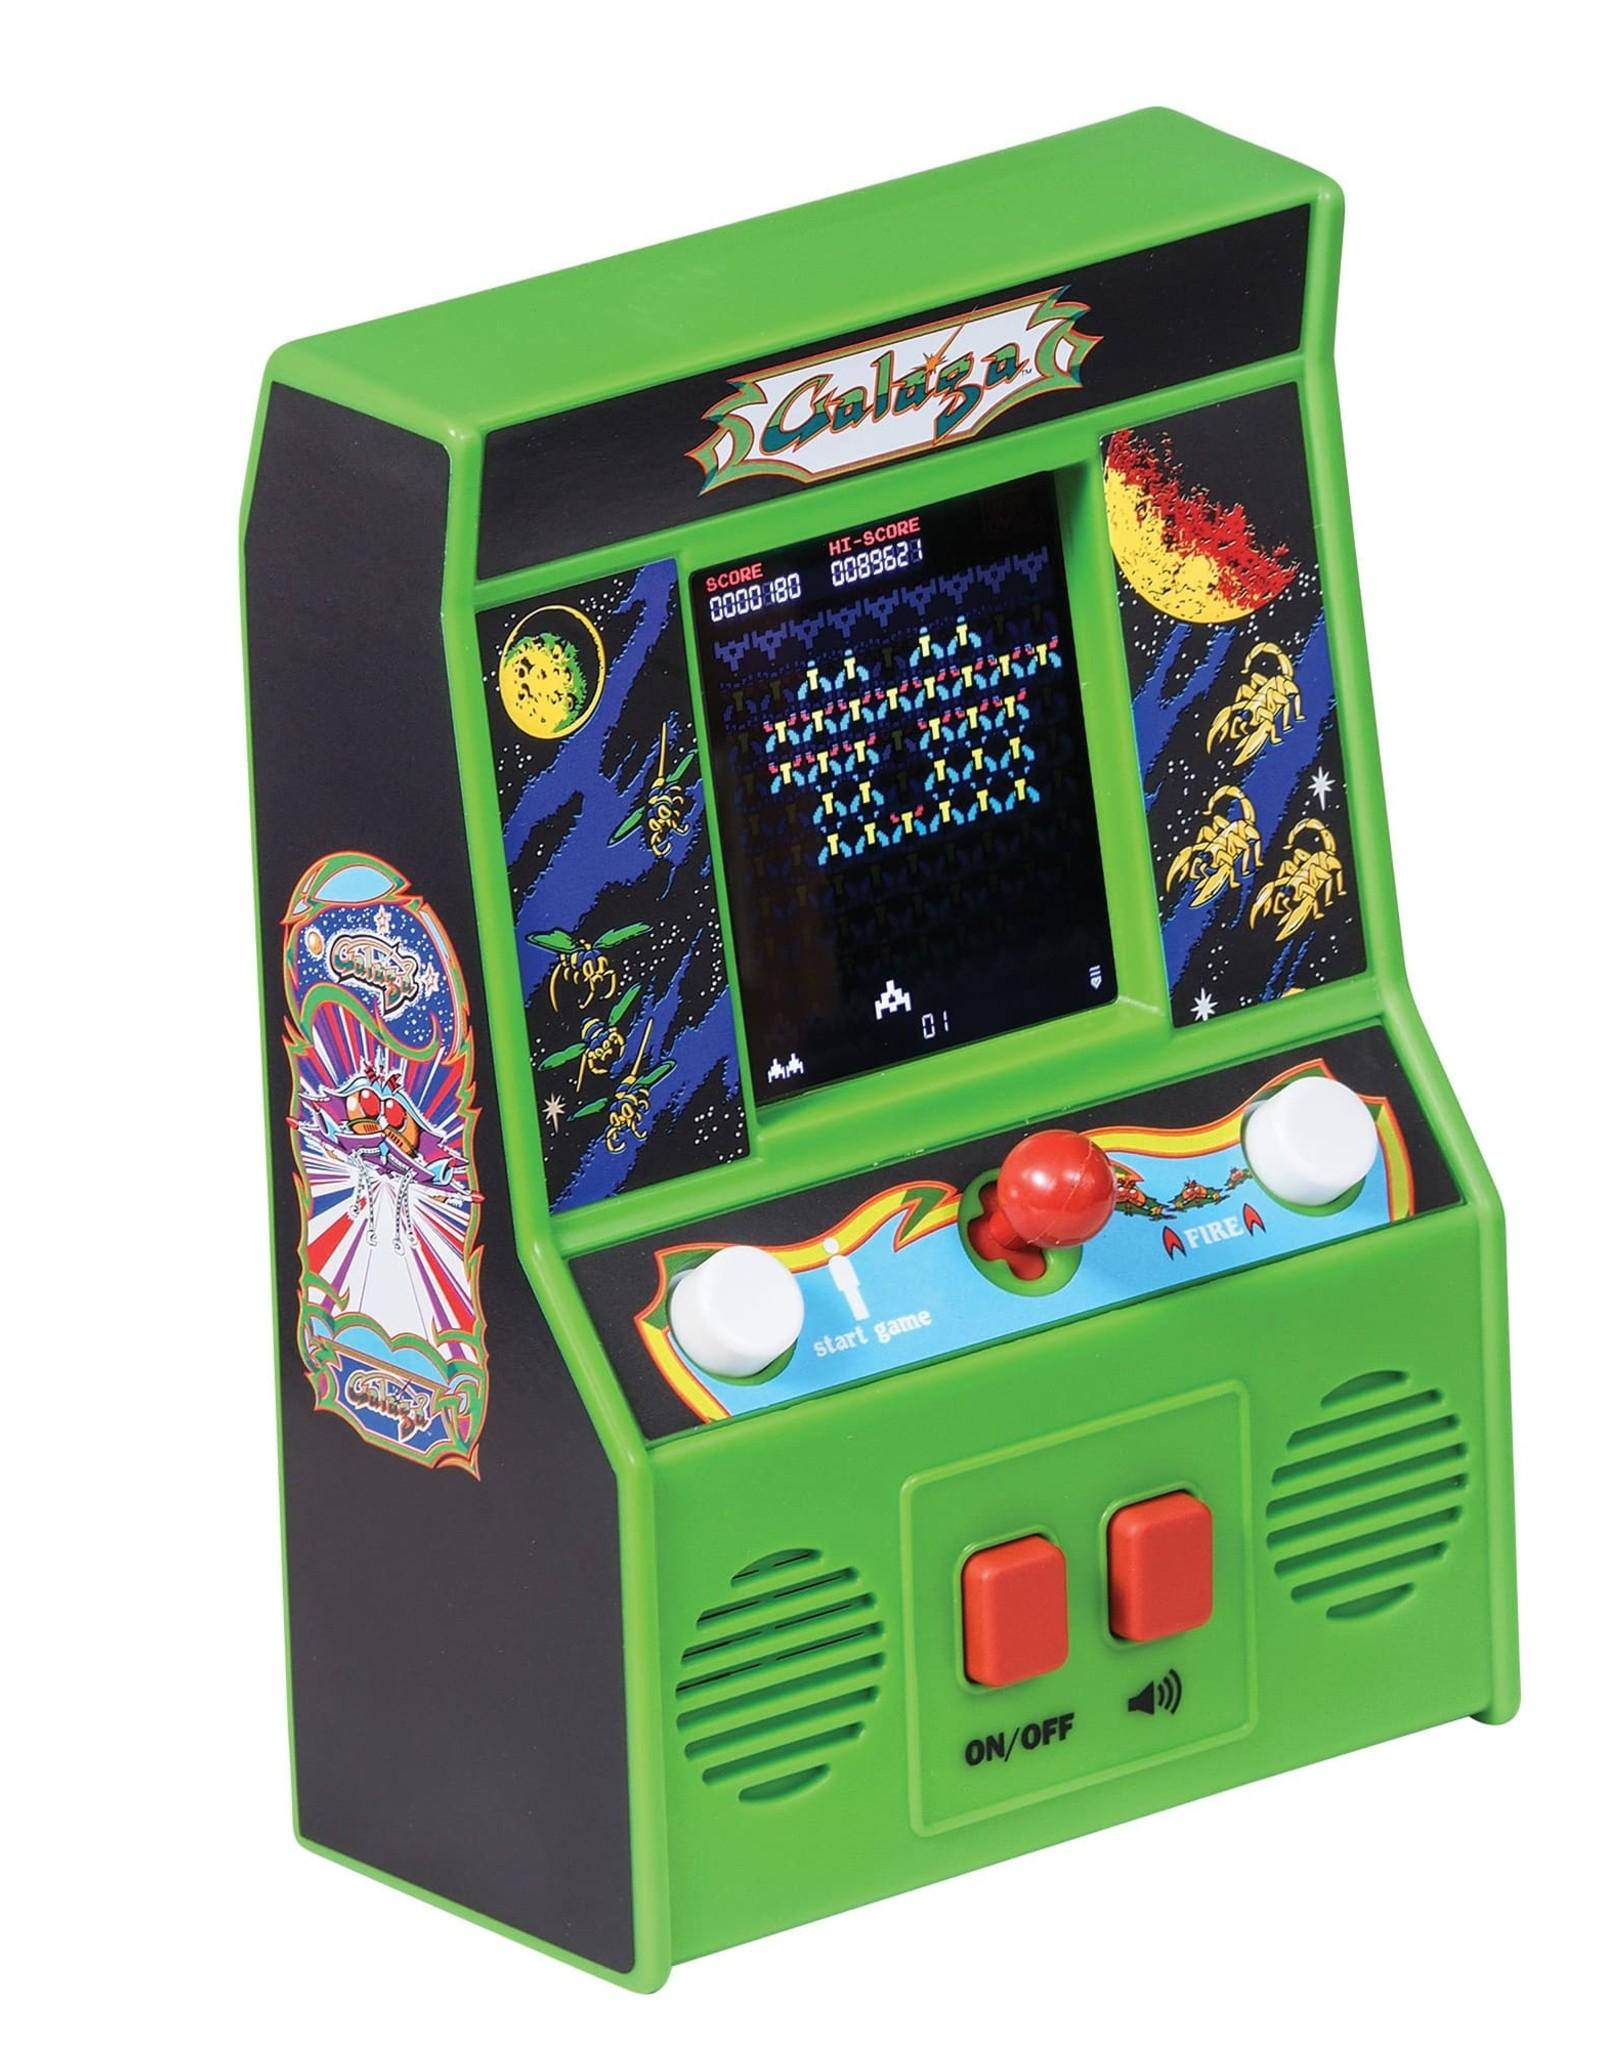 Schylling galaga mini arcade game